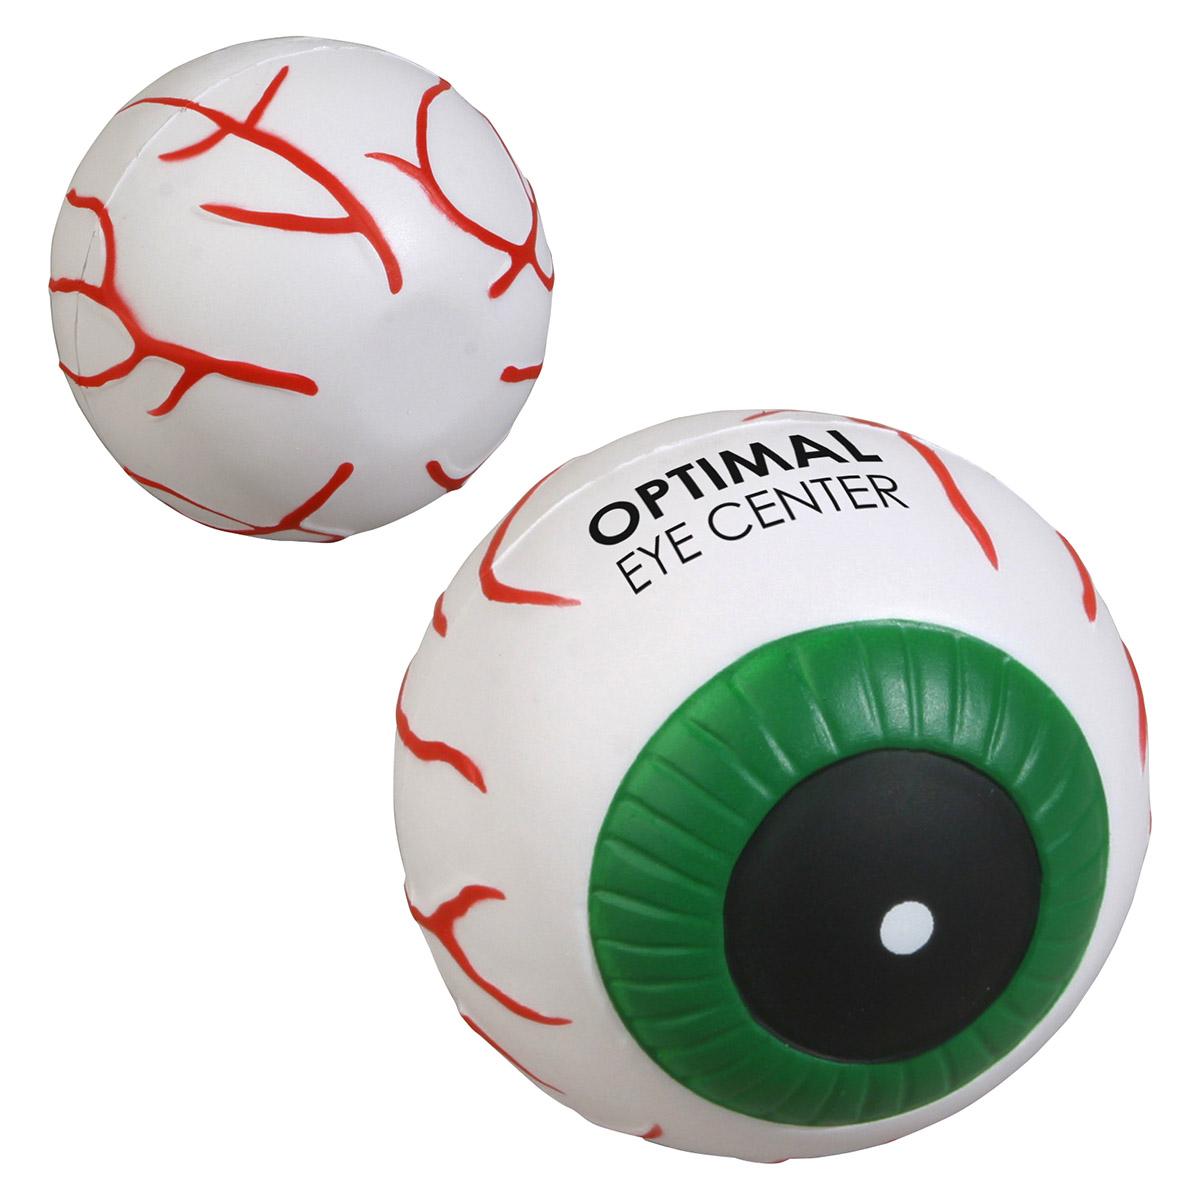 Eyeball Stress Reliever, LAN-EY08 - 1 Colour Imprint